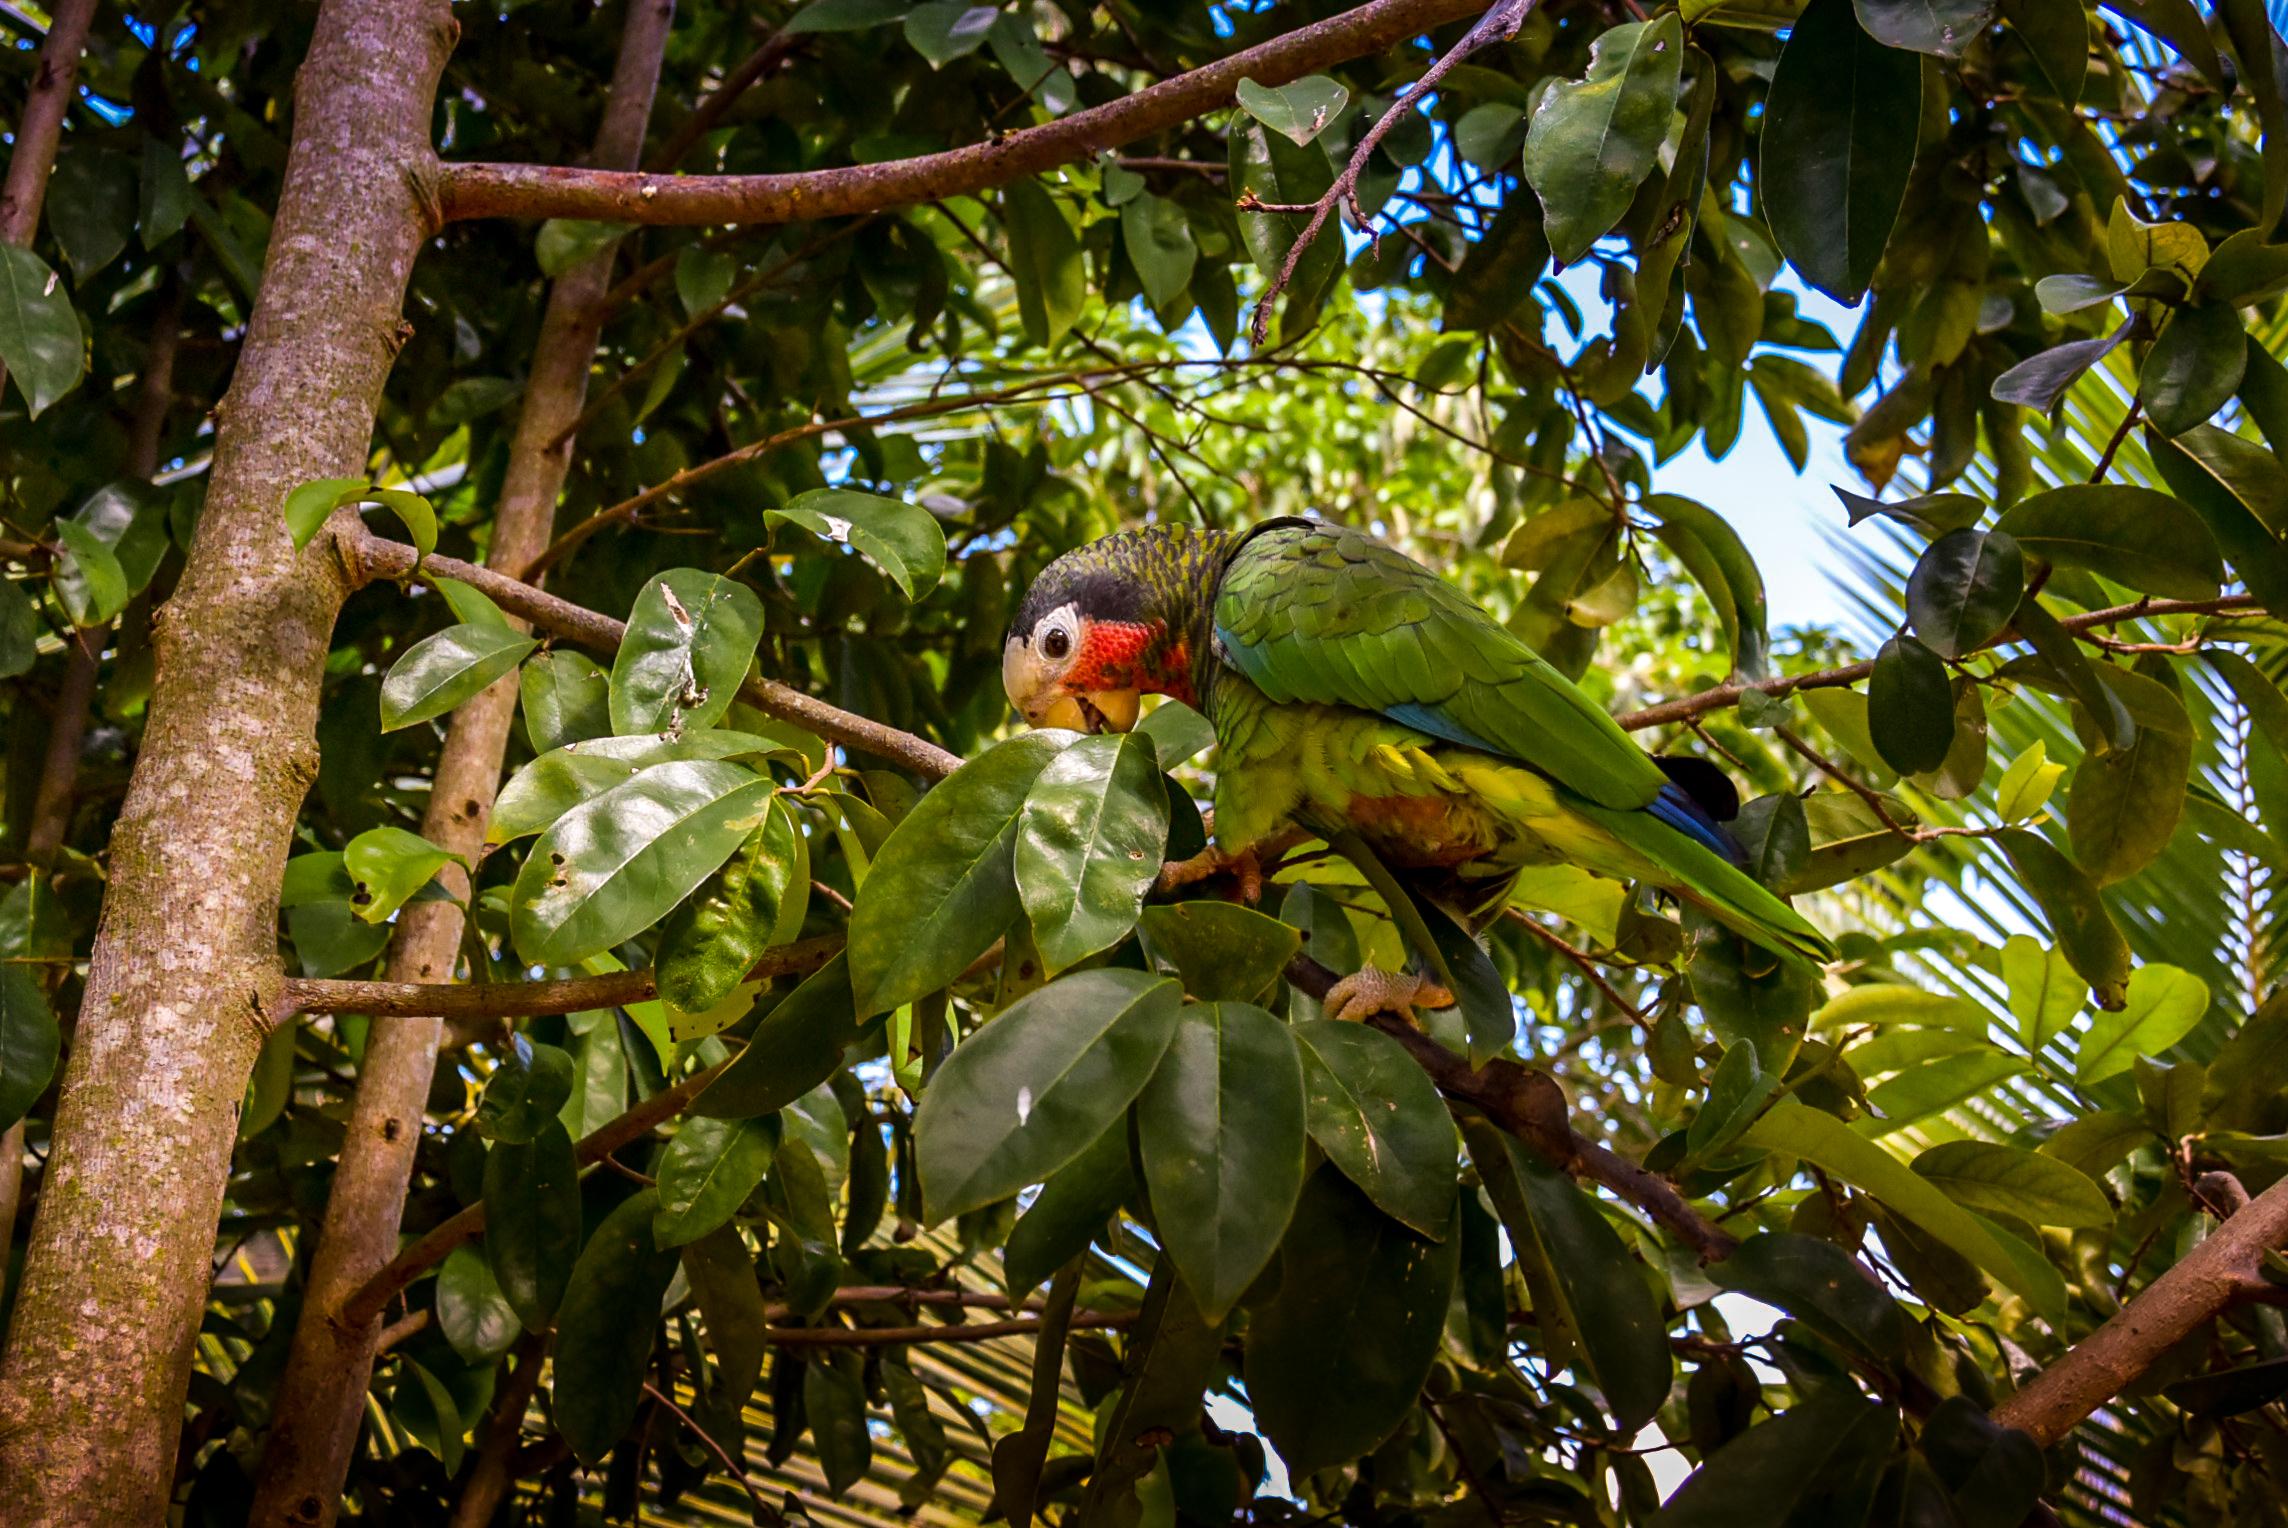 Parrot Jungle And Gardens Tickets Garden Ftempo